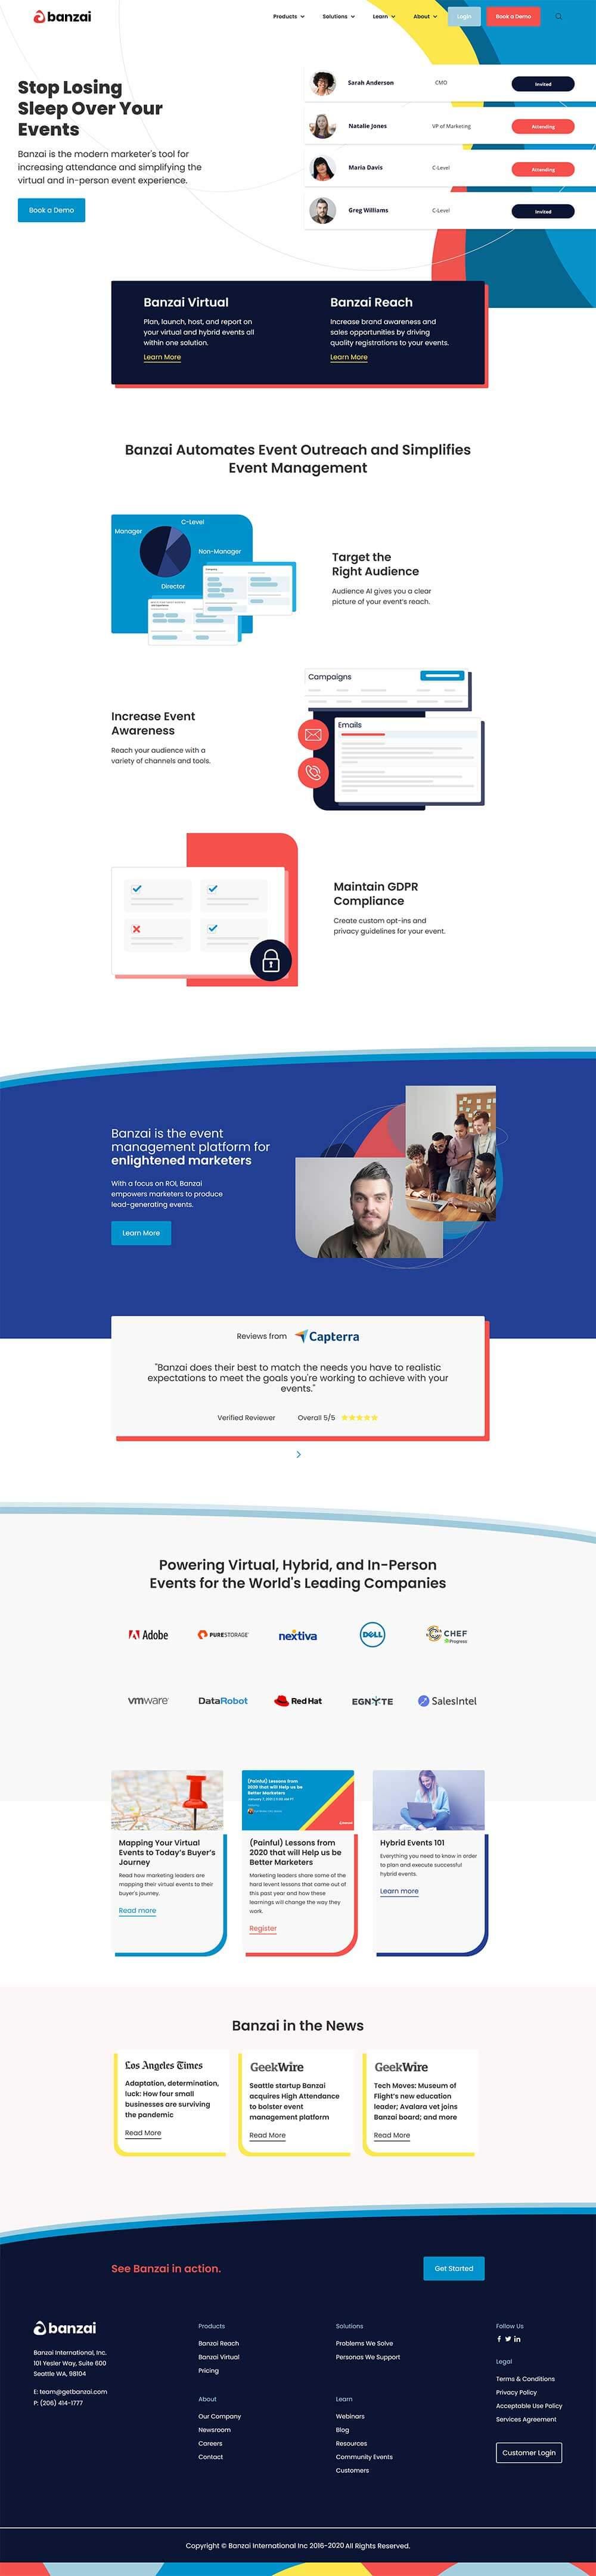 Banzai's new home page